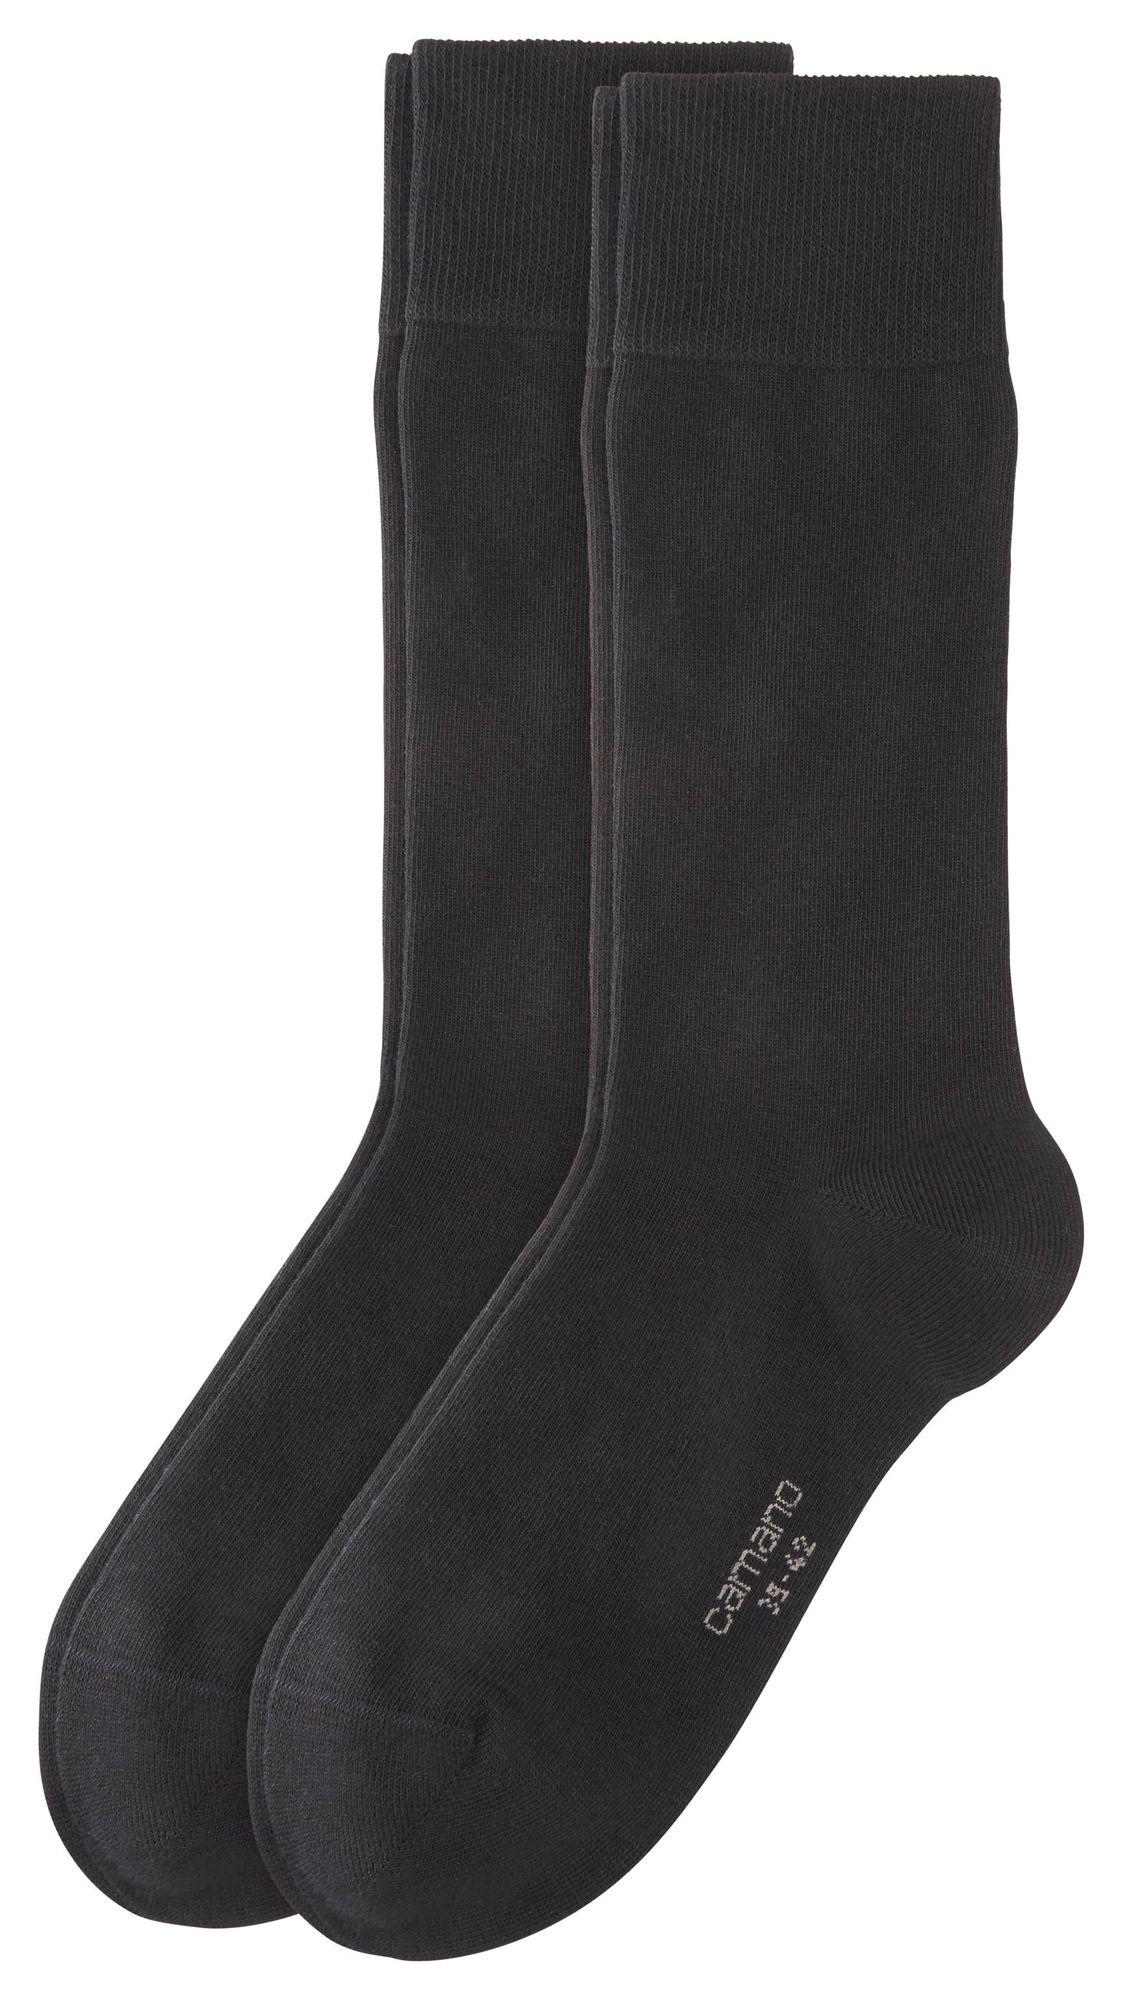 camano - Socken 2er Pack - Business Socken - Schwarz XXL Socken – Bild 1